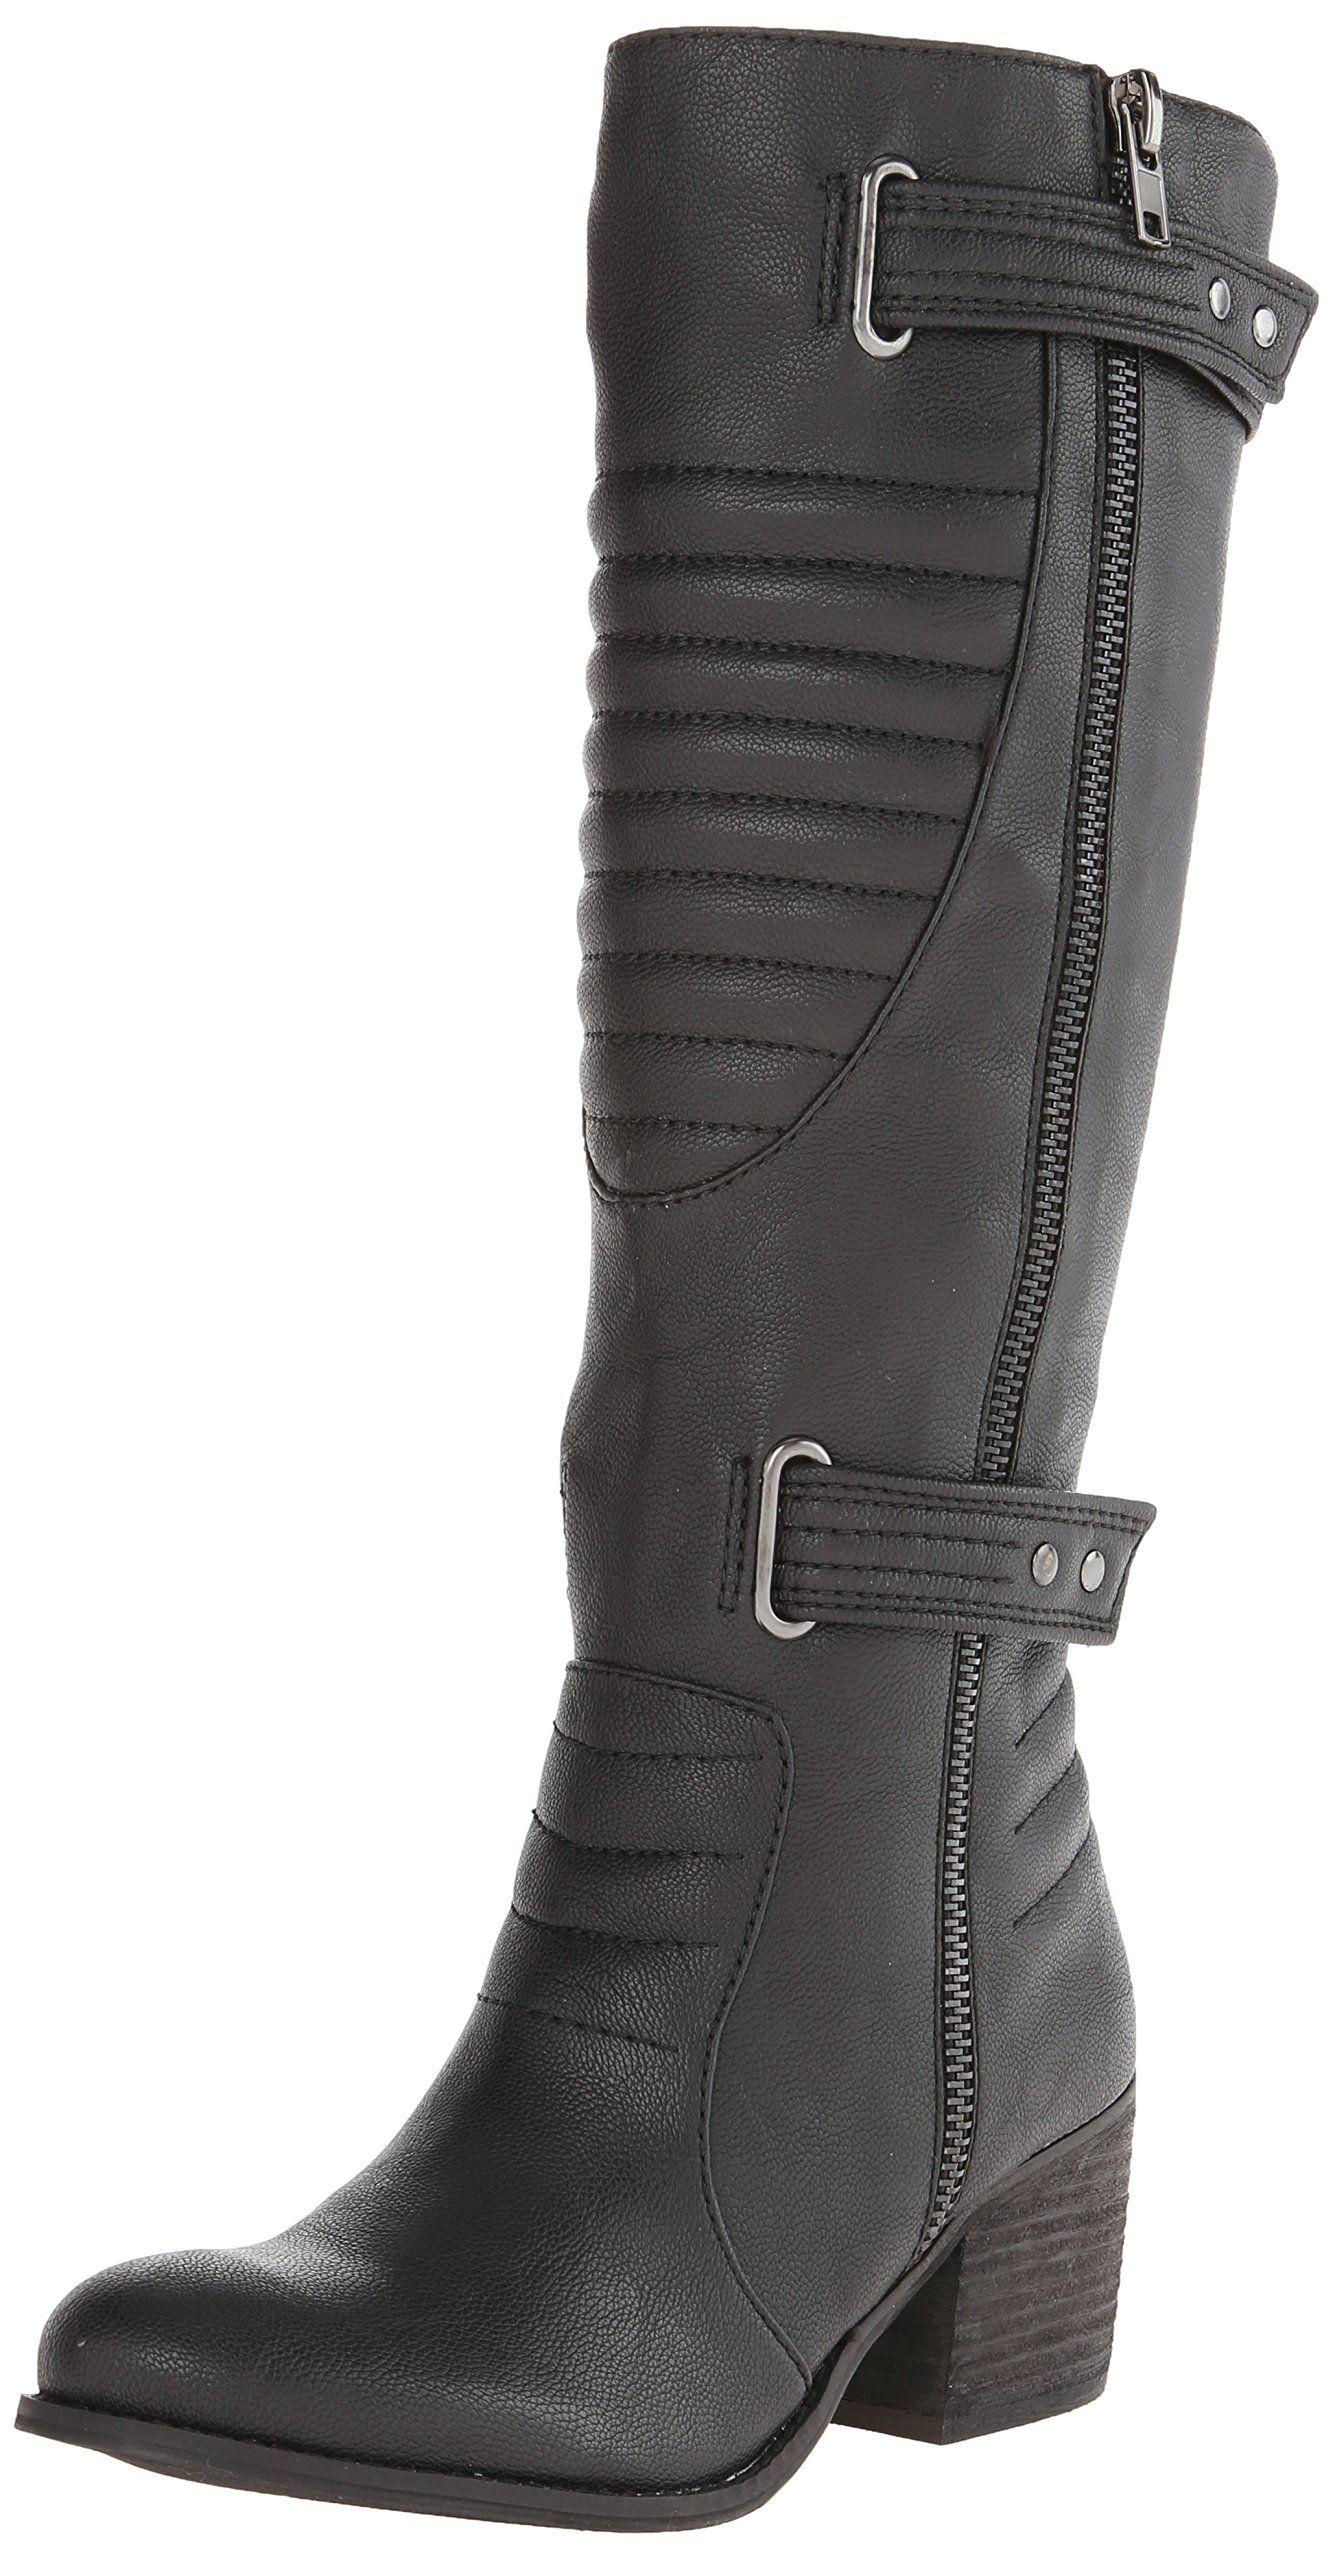 Carlos by Carlos Santana Women s Vesta Motorcycle Boot,Black,6 M US ... a9fbc6d727